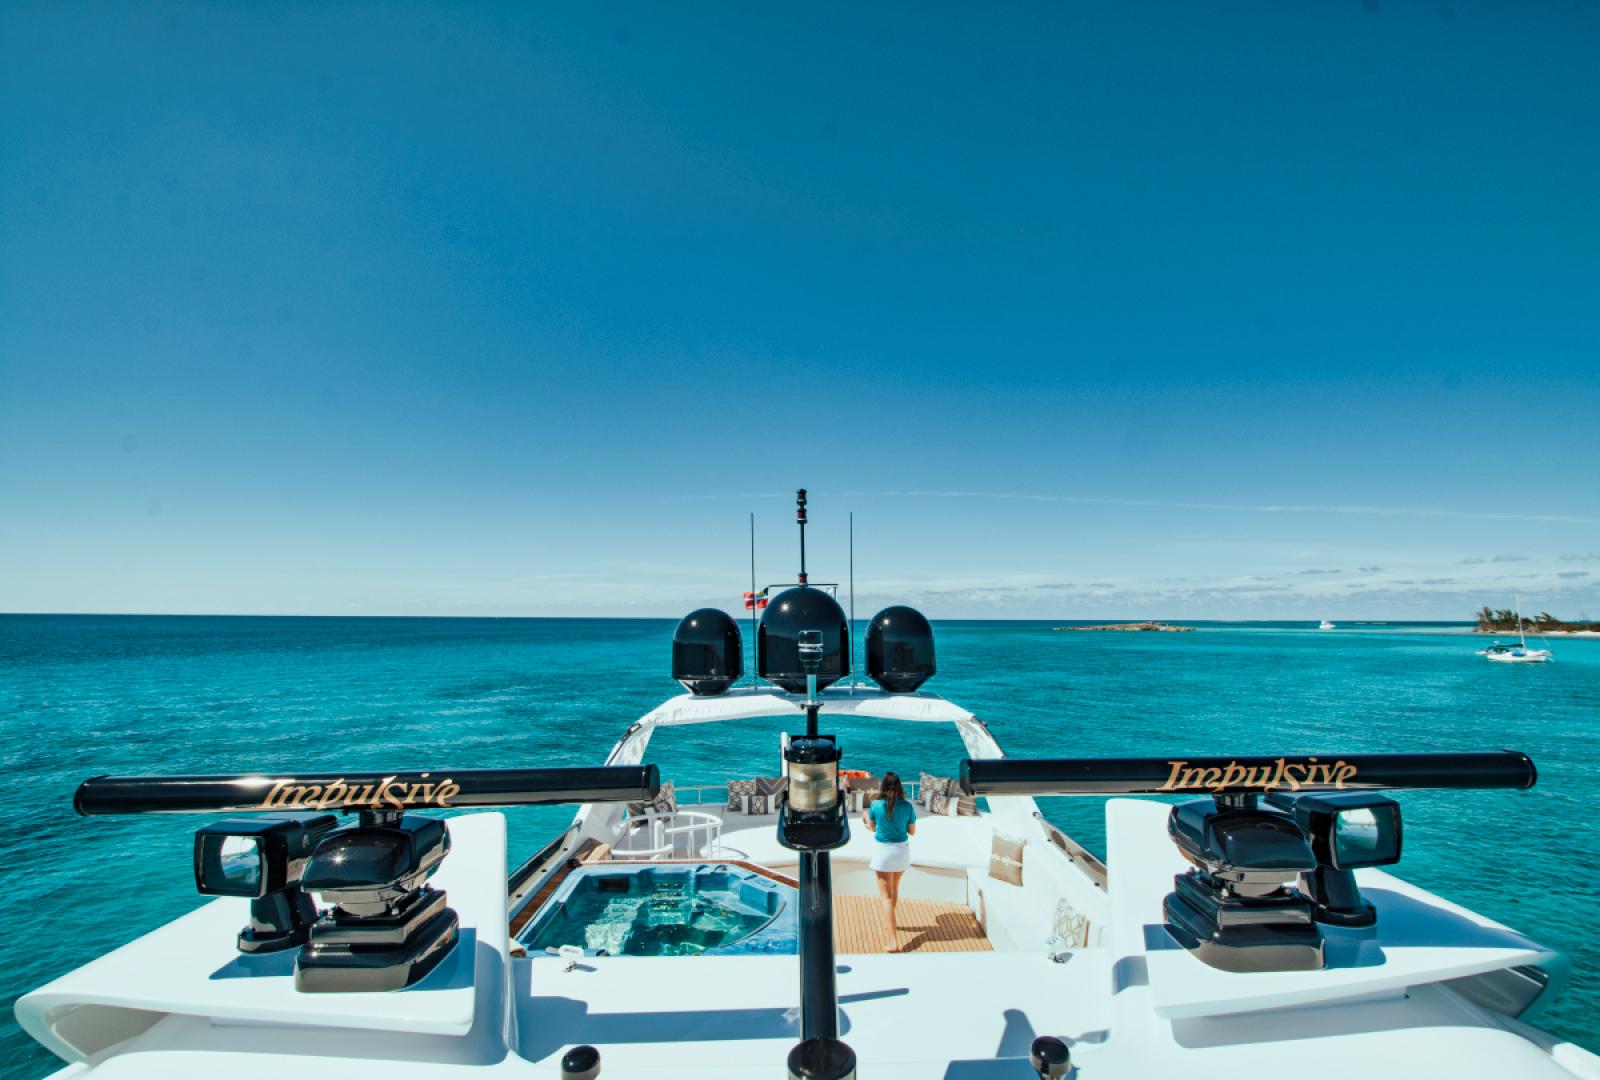 Motor Yacht-Norship 1994-Impulsive Fort Lauderdale-Florida-United States-1562570 | Thumbnail